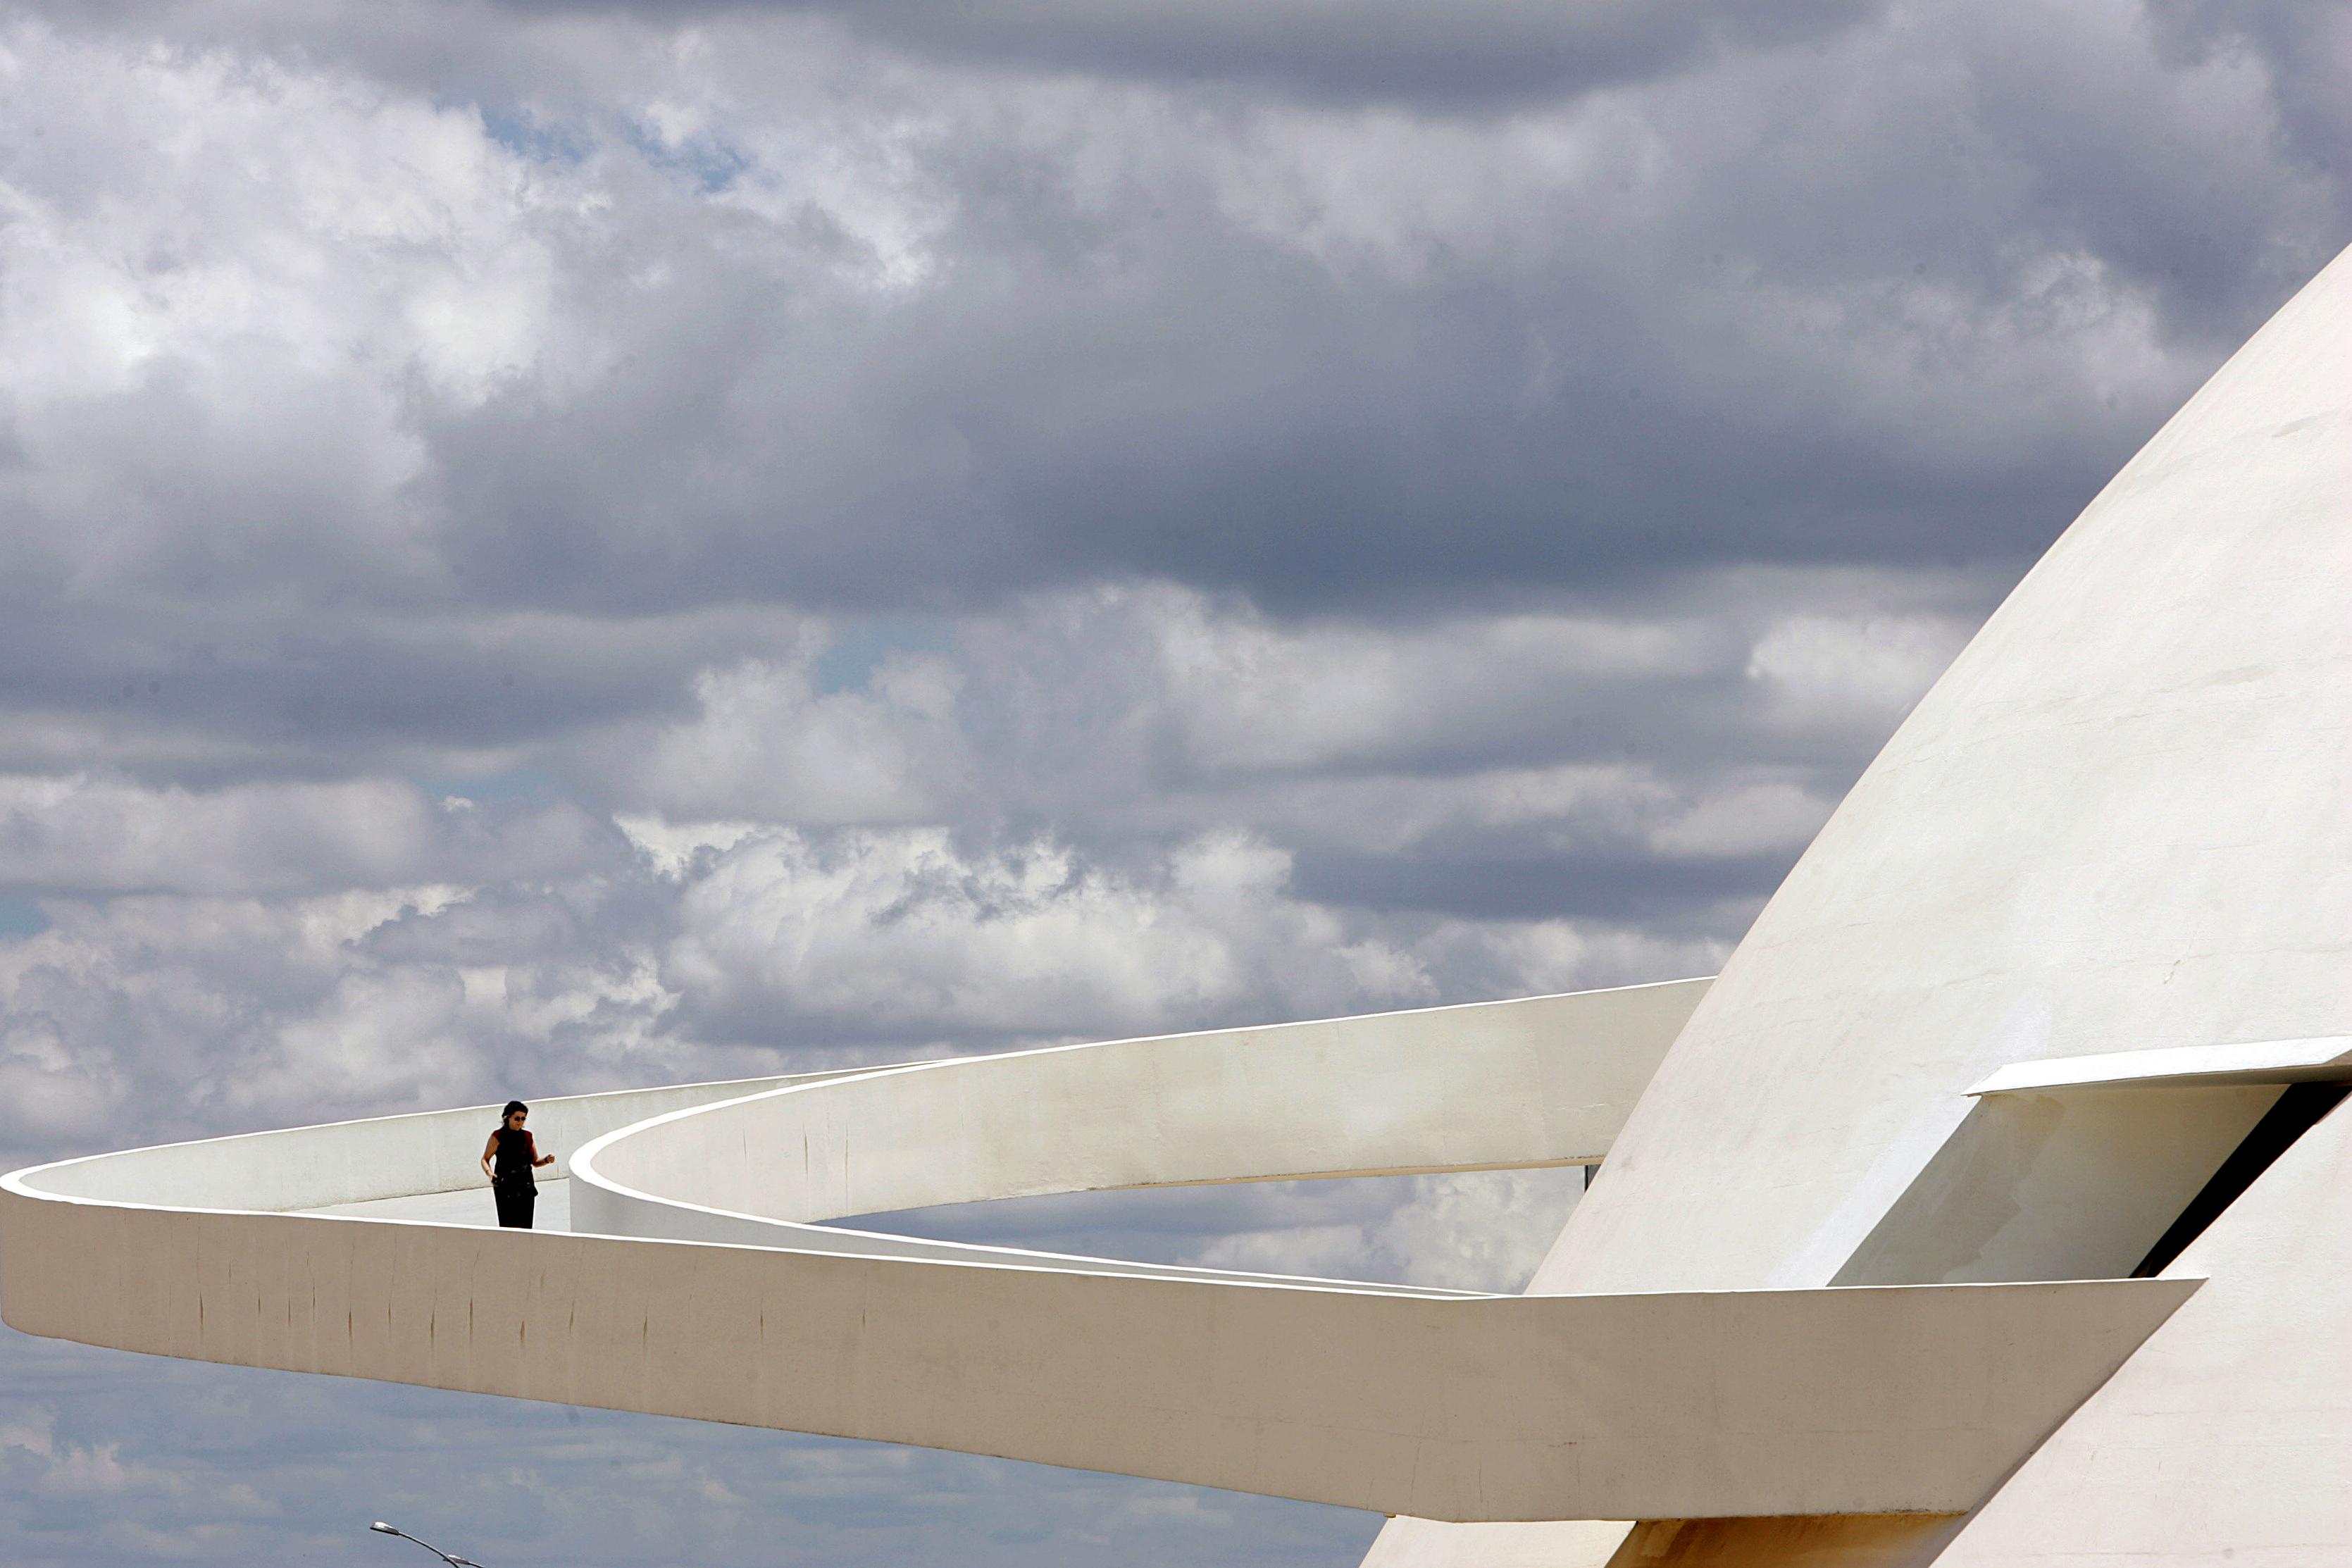 Brasilia's National Museum, inaugurated in 1960.